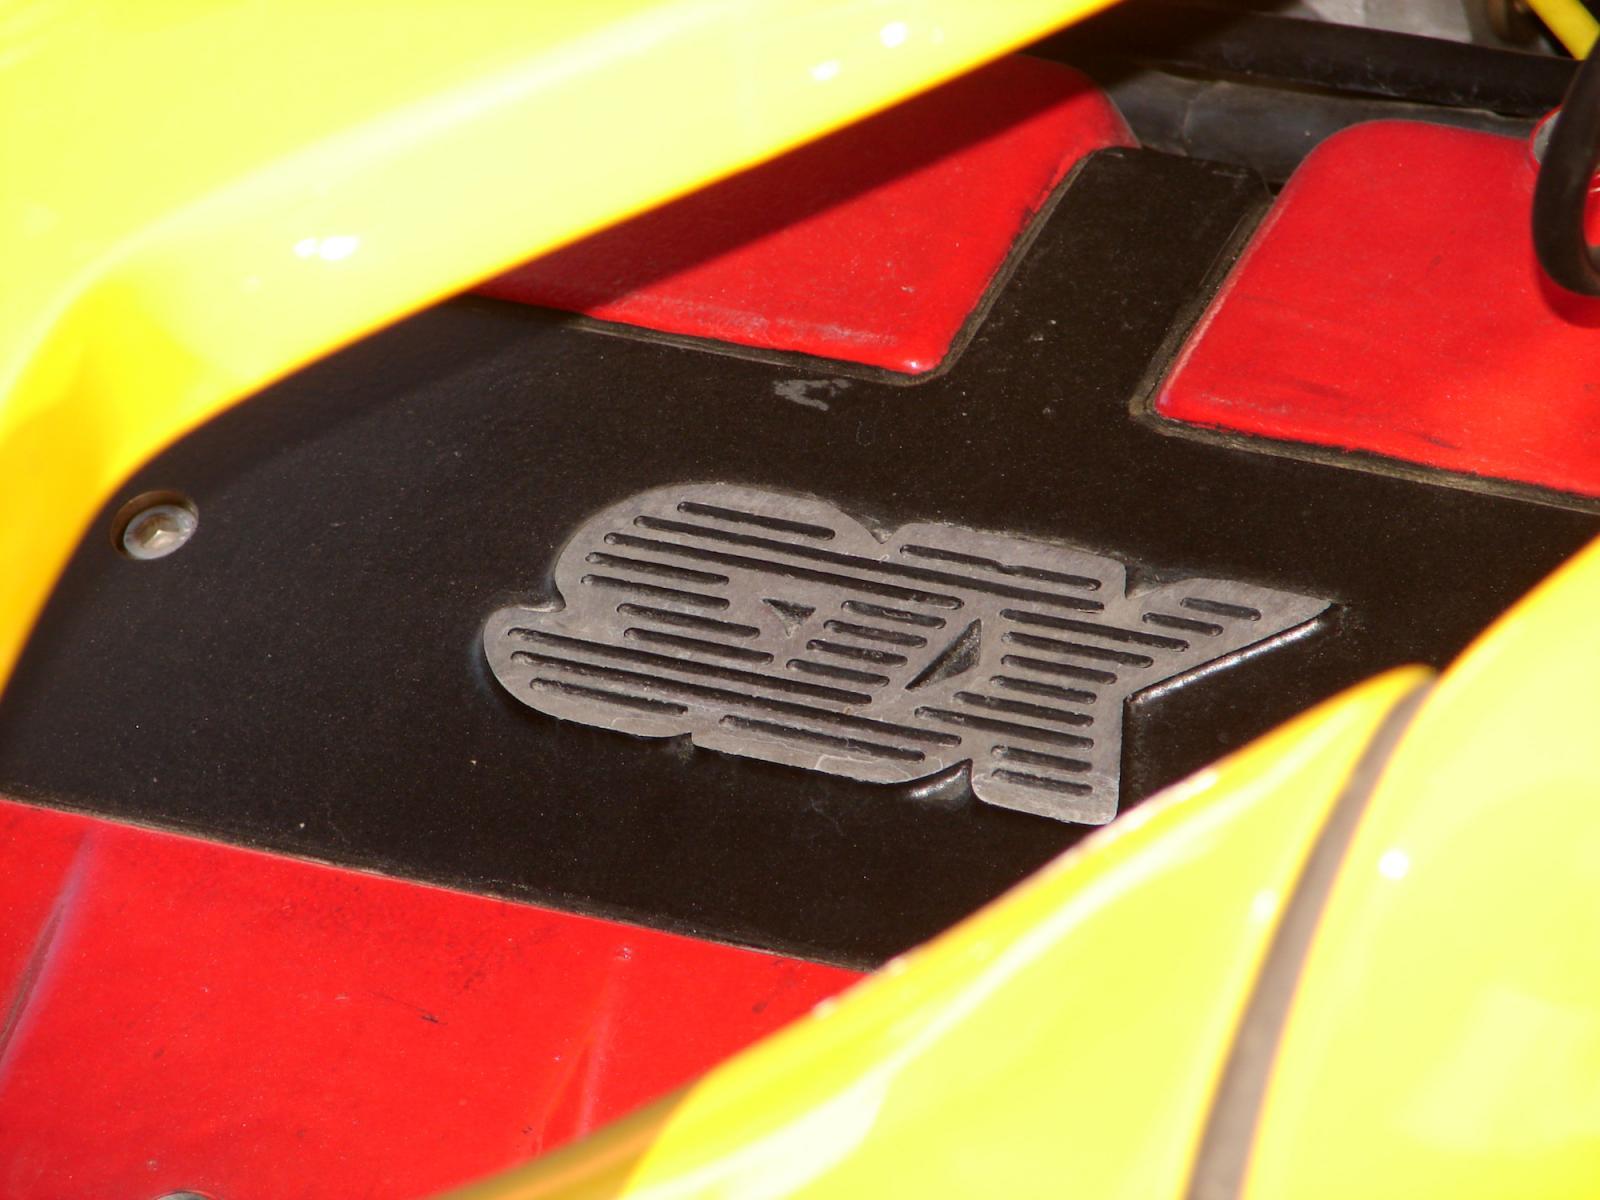 tvr-cerbera-speed-six-1 copie